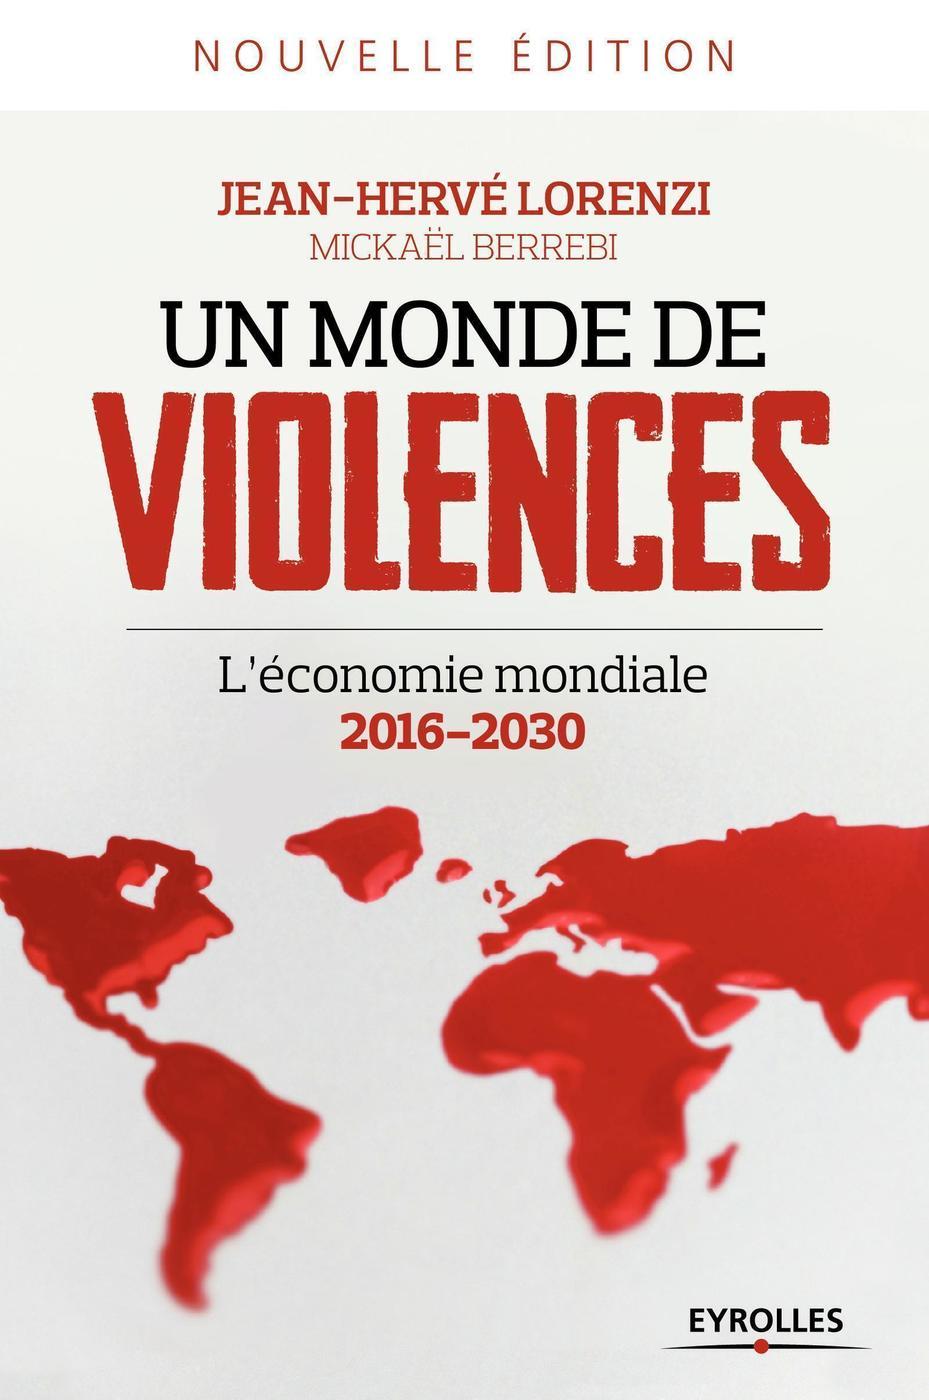 Un Monde De Violences Jean Herve Lorenzi Mickael Berrebi Librairie Eyrolles